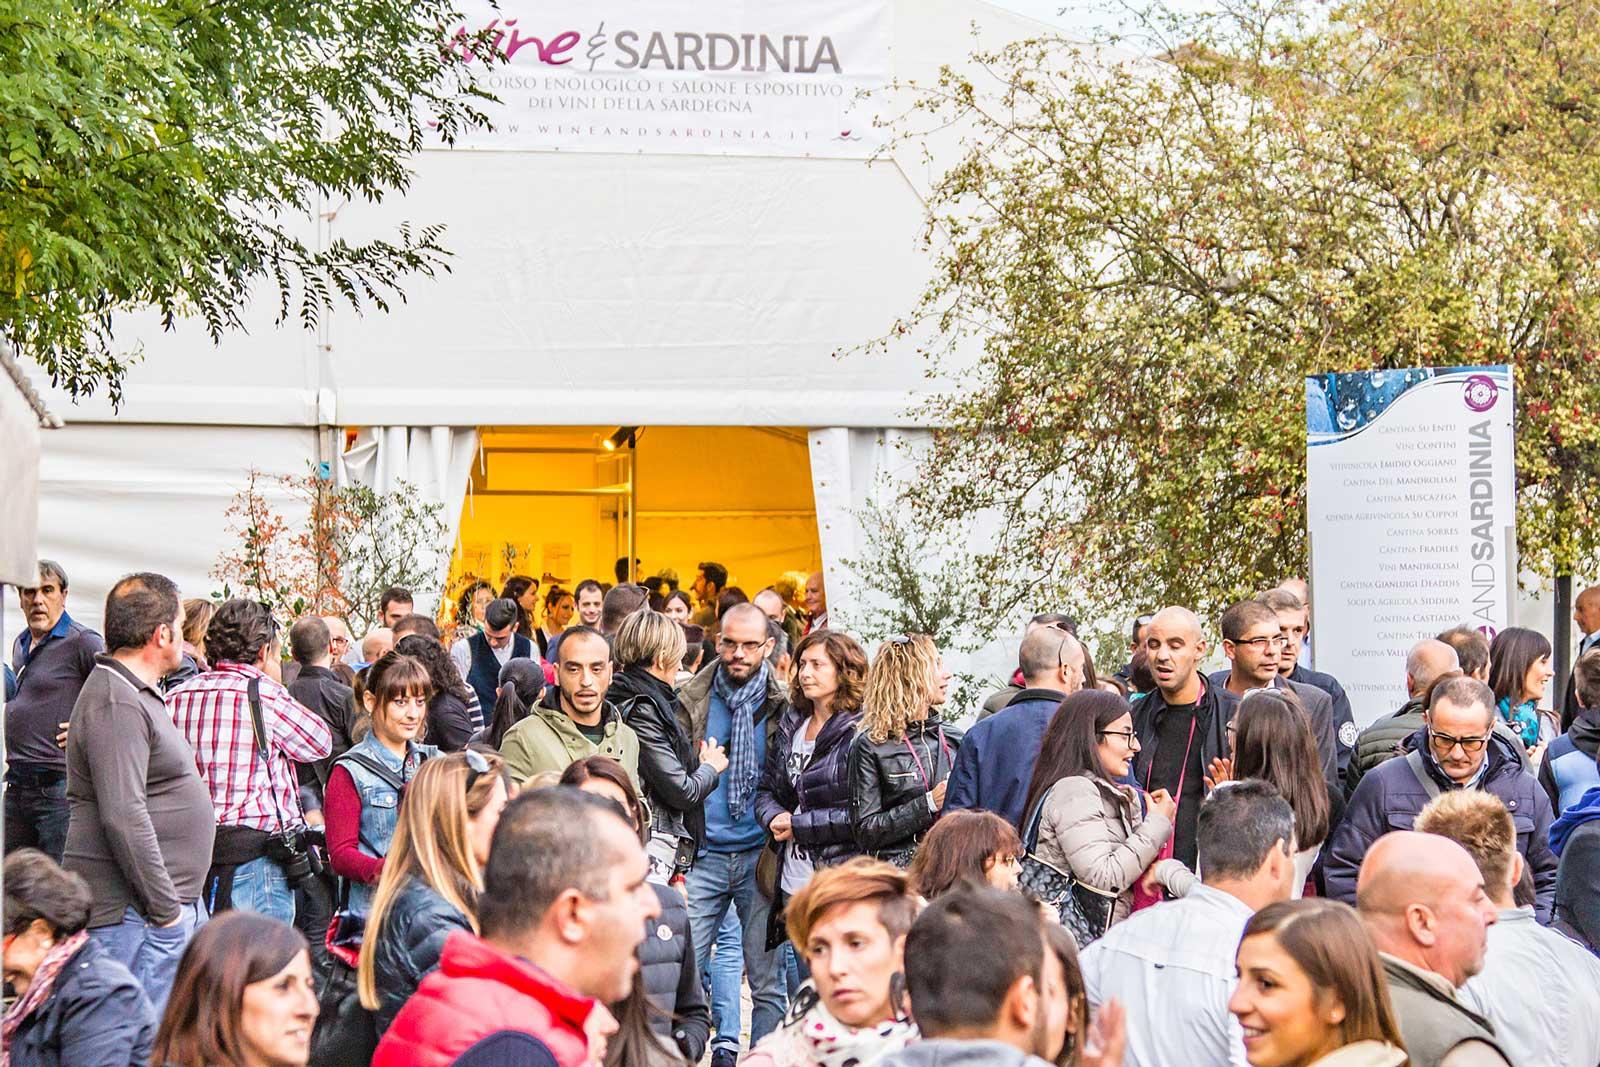 Folla di wine lovers al Wine And Sardinia 2018